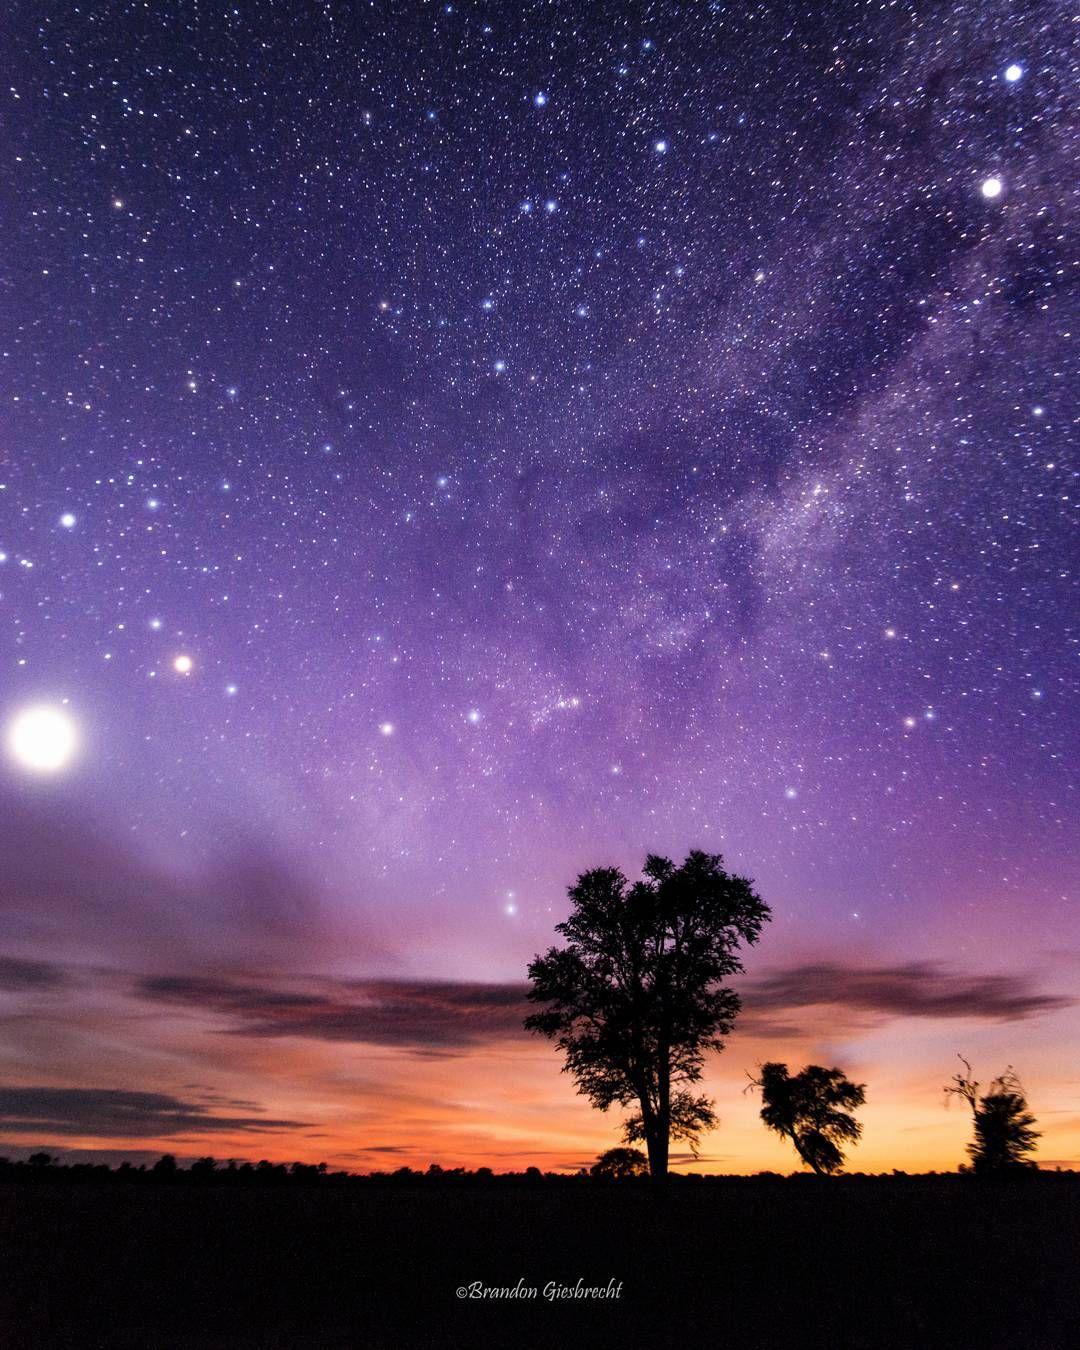 On instagram by giesbrechtbrandon #astrophotography #contratahotel (o) http://ift.tt/1PBh3yC y la via lactea saliendo unos minutos antes del amanecer.  #chaco #paraguay  #astrography. #milkyway #venus #vialactea #astrofotografia #sunrise #longexposure #earthfocus #instagood #featuremeinstagood #pro_ig @universetoday #jaw_dropping_shots #theworldshotz #instapy #pyfotografia #global_hotshotz #travelsouthamerica #discoversouthamerica @discoverearth #canon_photos #ig_all_americas #americas…